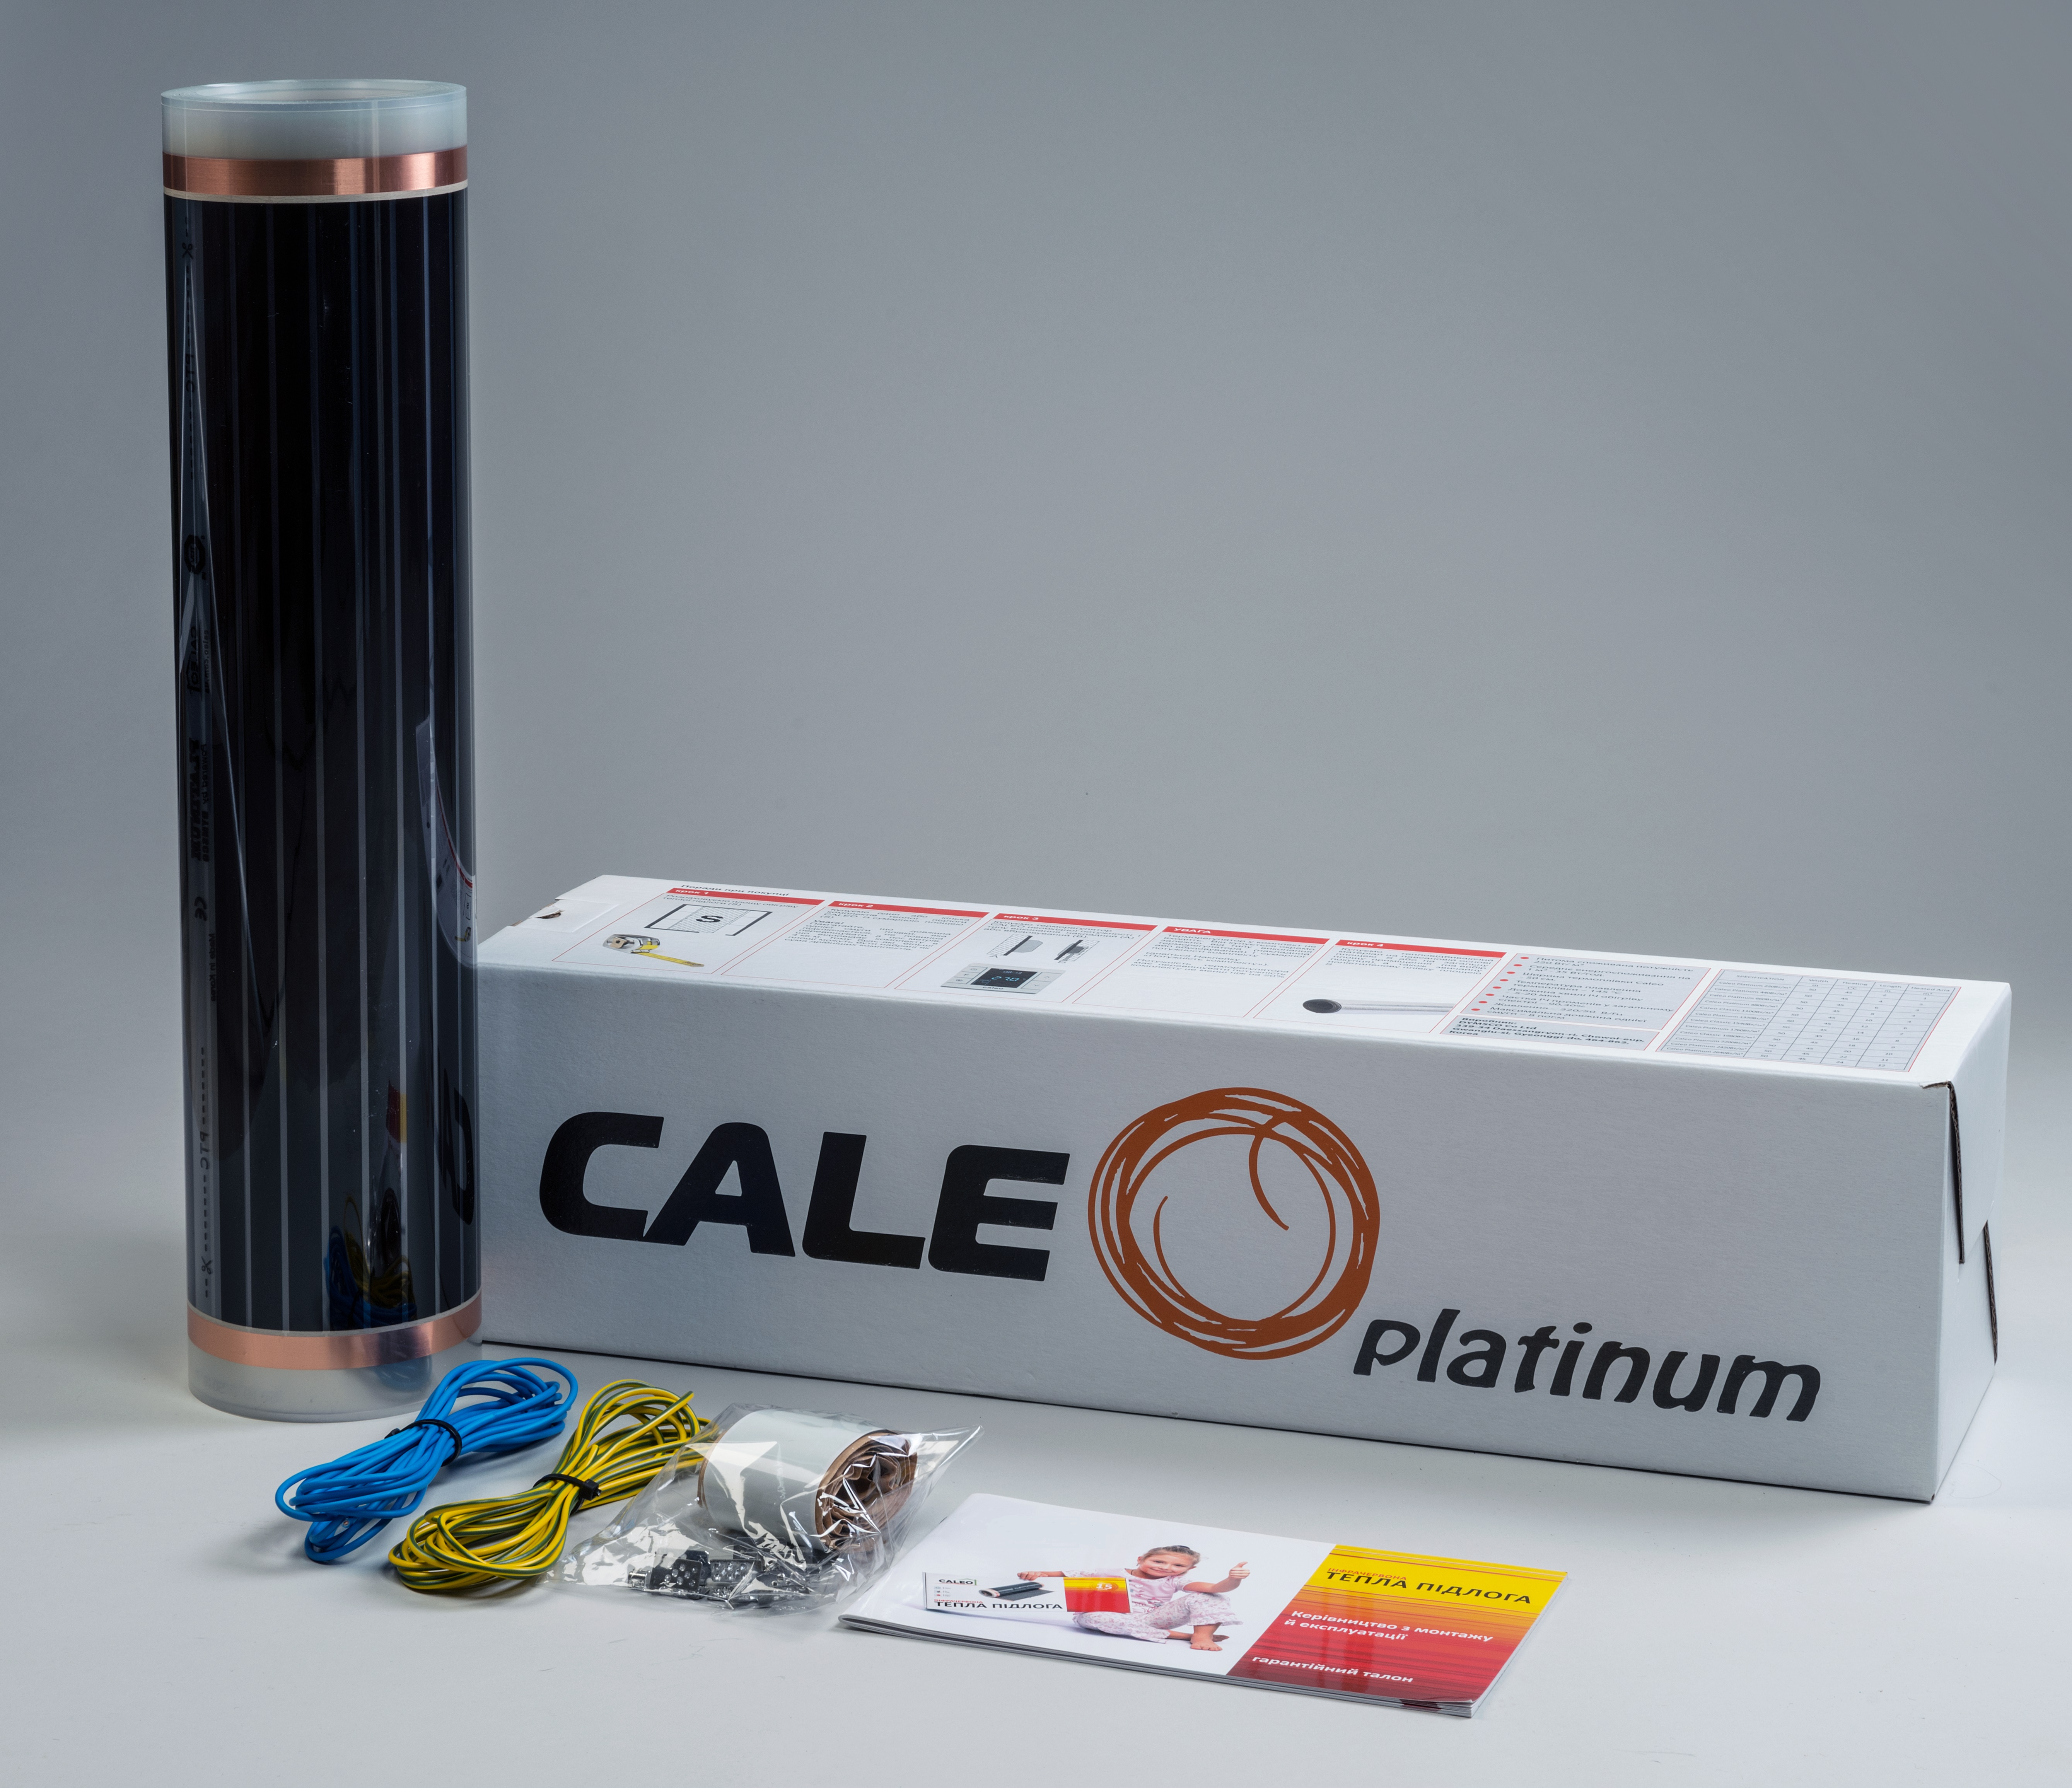 caleo (южная корея) Caleo Platinum 220-0,5-3.0 (3 м2)